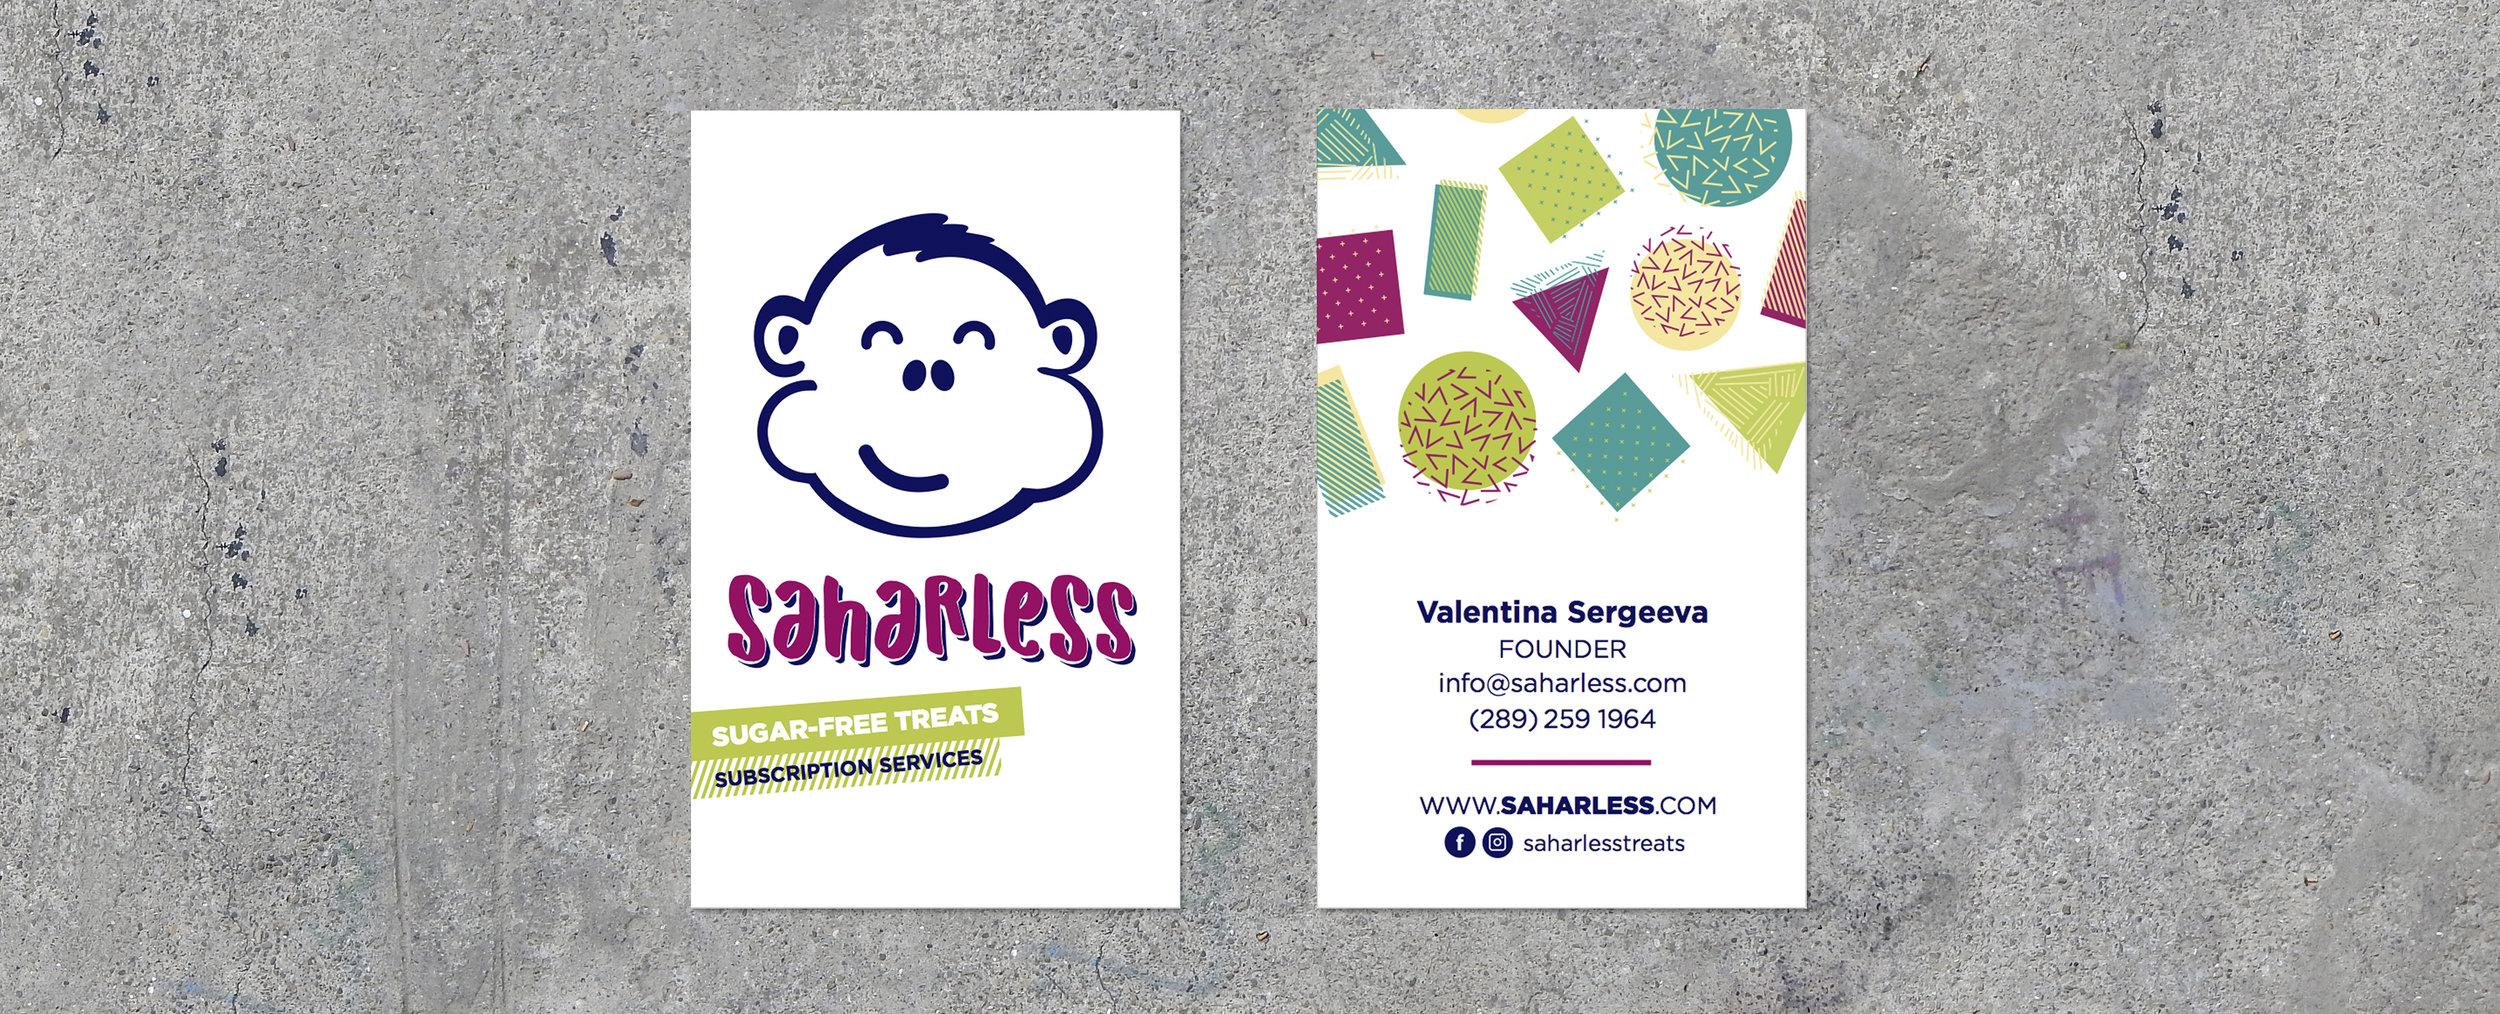 Saharless Business Cards (above)